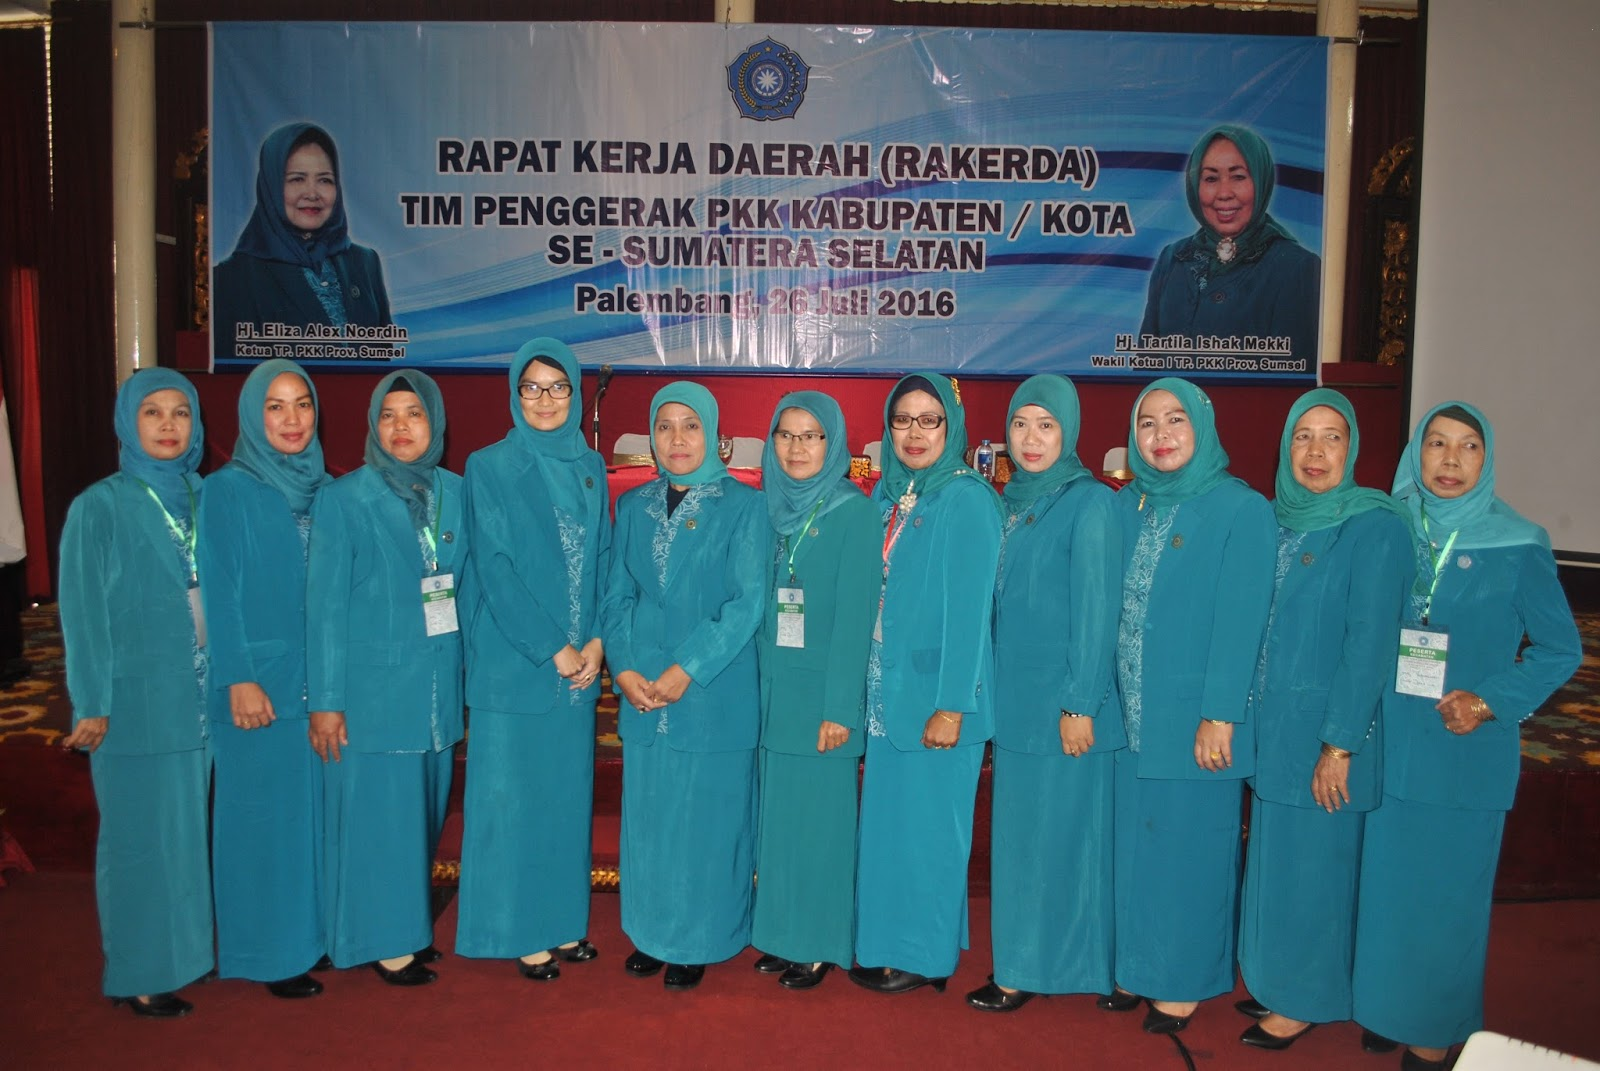 Palembang Ketua Tim Penggerak Pkk Kabupaten Ogan Ilir Beserta Anggota Hadiri Rapat Kerja Daerah Rakerda Se Sumatera Selatan Di Palembang Hari Selasa